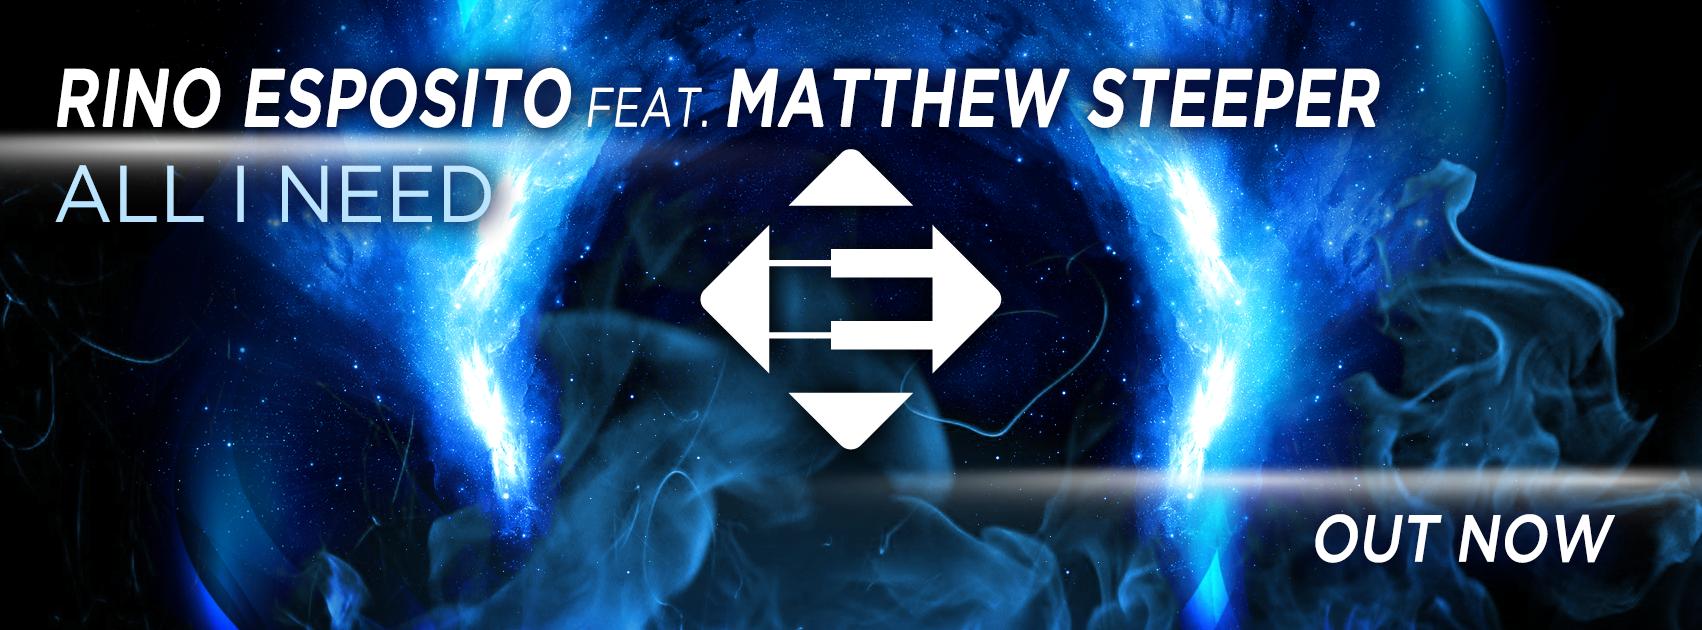 Rino Esposito feat. Matthew Steeper - All I Need [Ensis Records]